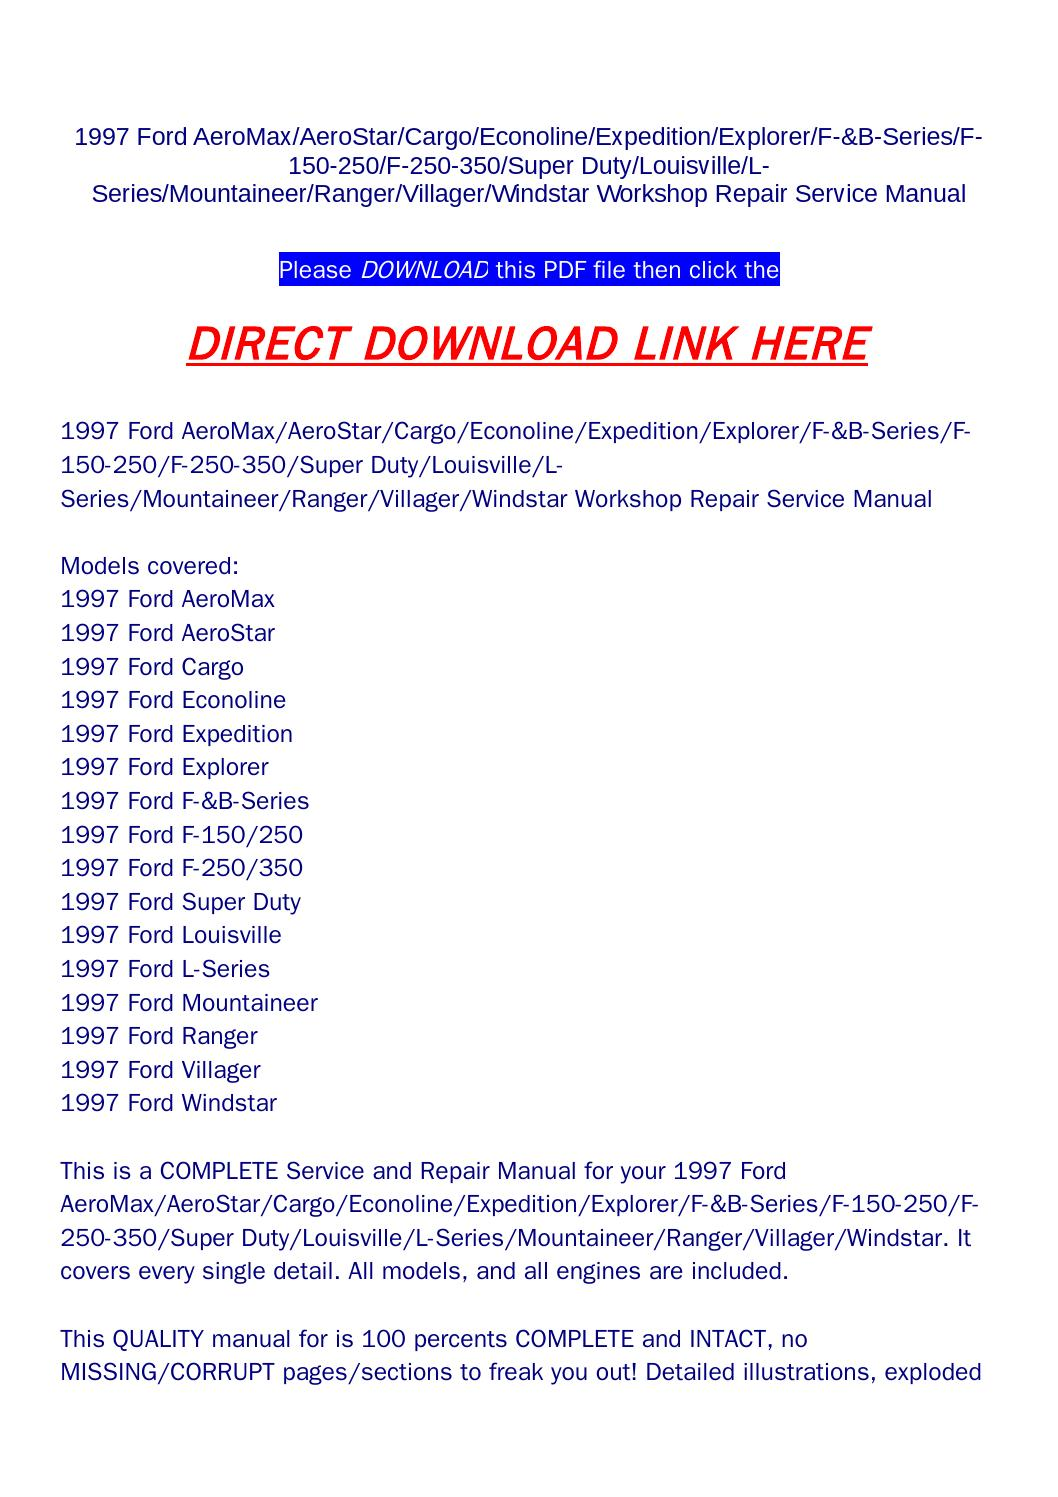 Car Manuals & Literature Vehicle Parts & Accessories 1997 ford ...